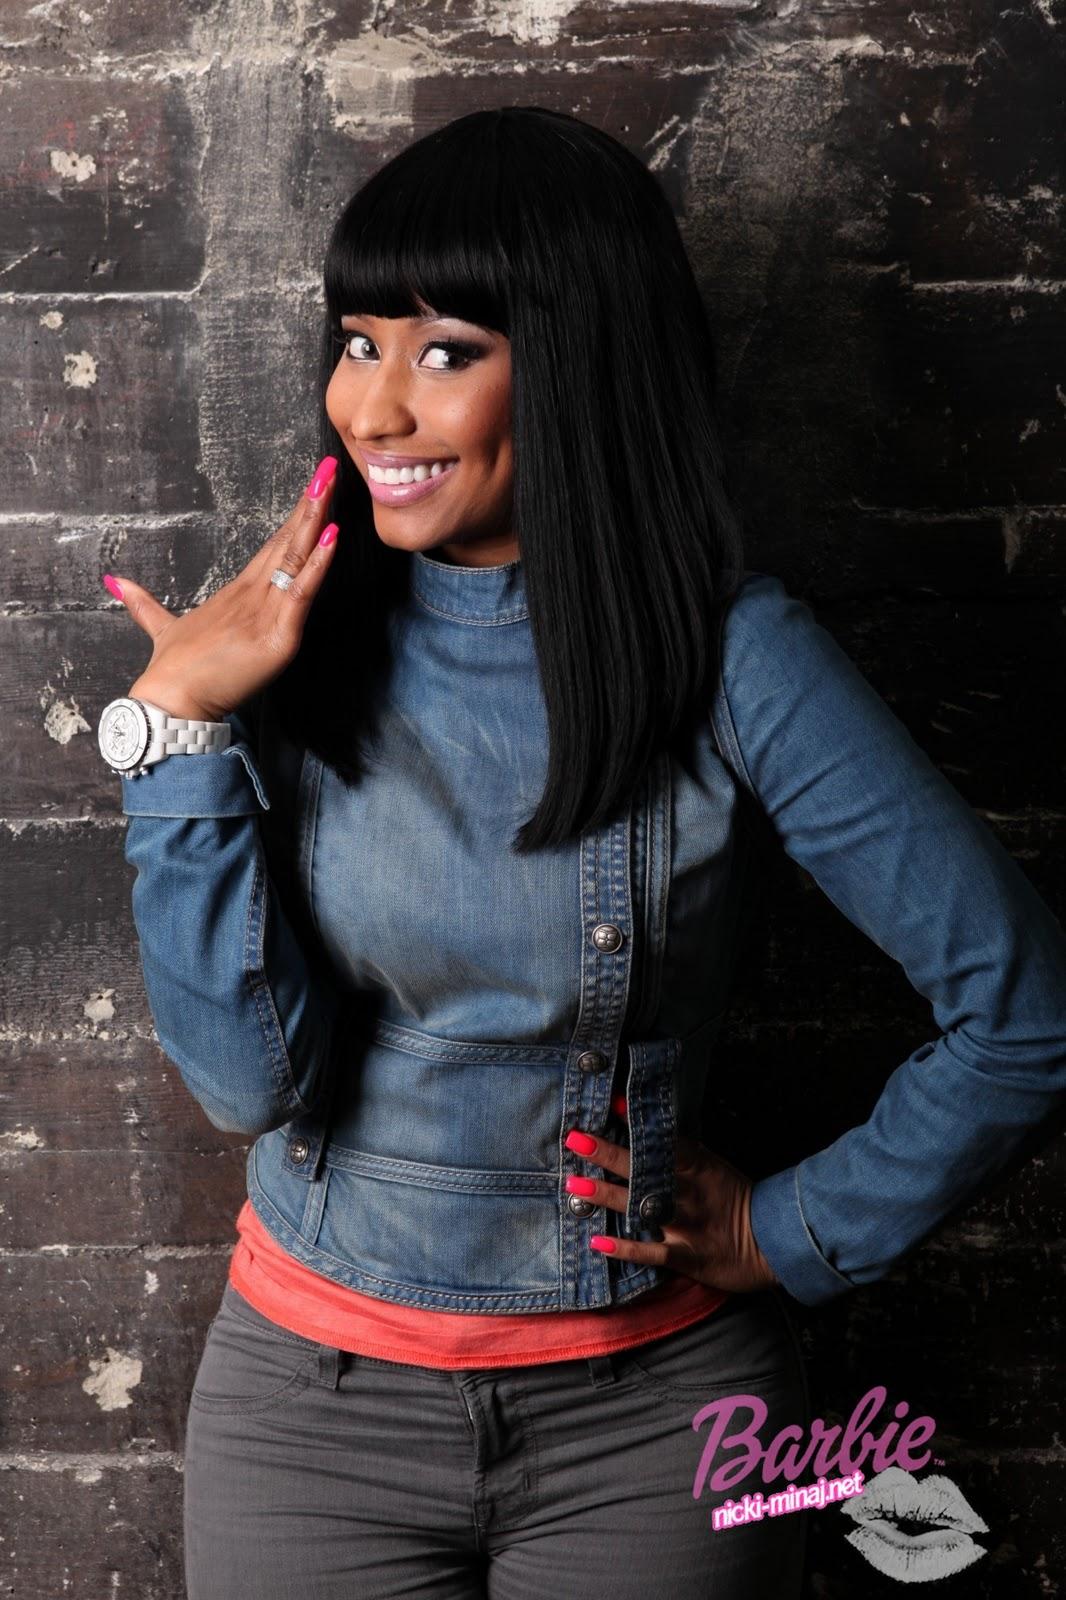 http://3.bp.blogspot.com/-dFCZvrT9FSs/TvwPNHlsmmI/AAAAAAAABZU/aSnFj6LdRSQ/s1600/Nicki-Minaj-superbass-lyrics-album-hairstyles+%25289%2529.jpg